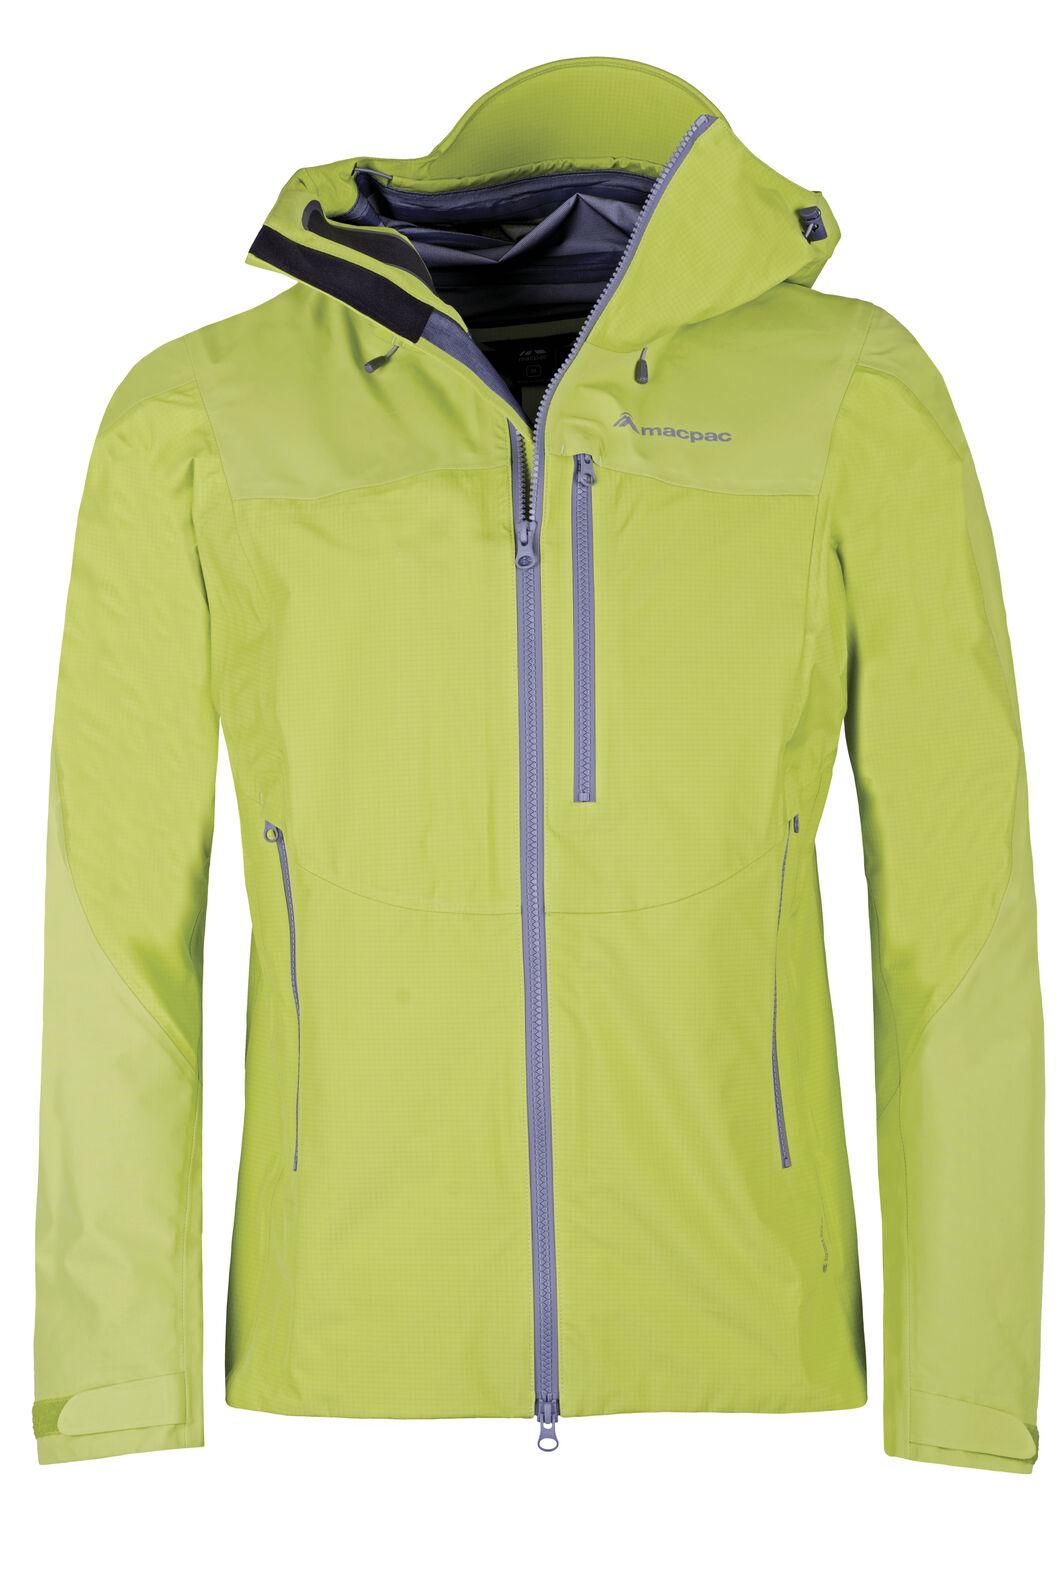 Macpac Lightweight Prophet Pertex® Rain Jacket — Men's, Apple, hi-res